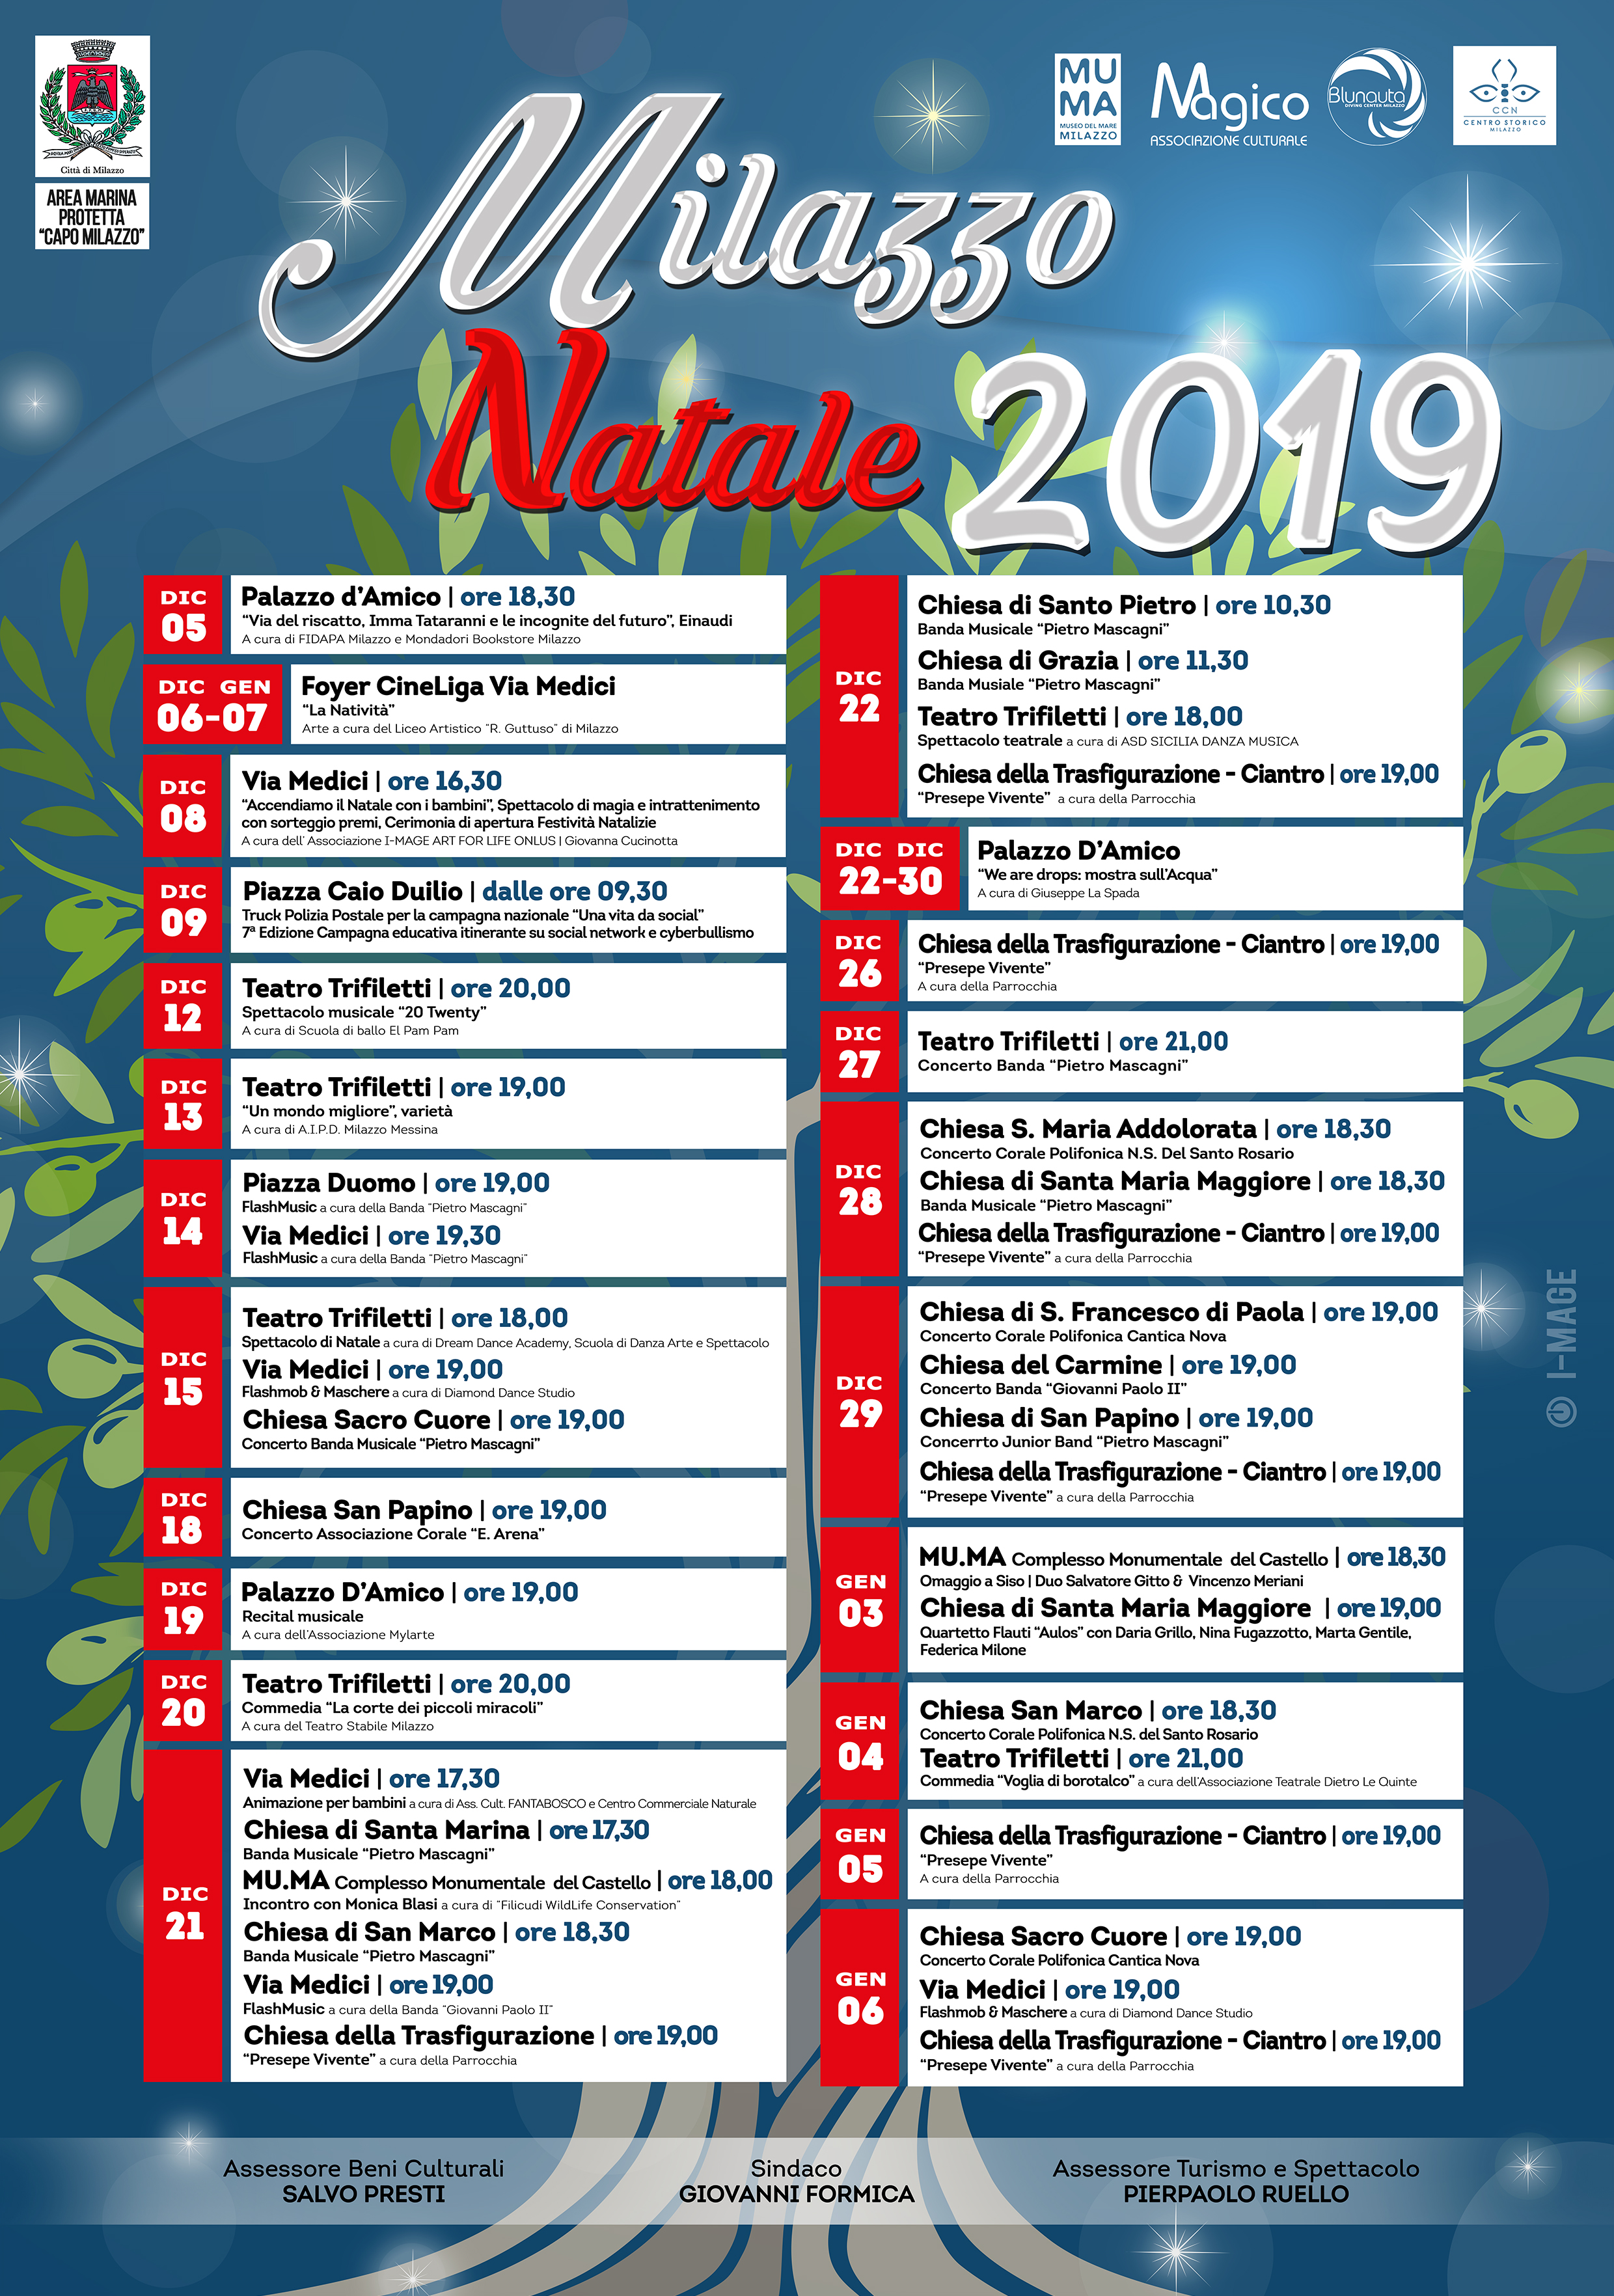 2019_11_25 - Milazzo Natale 2019_A4